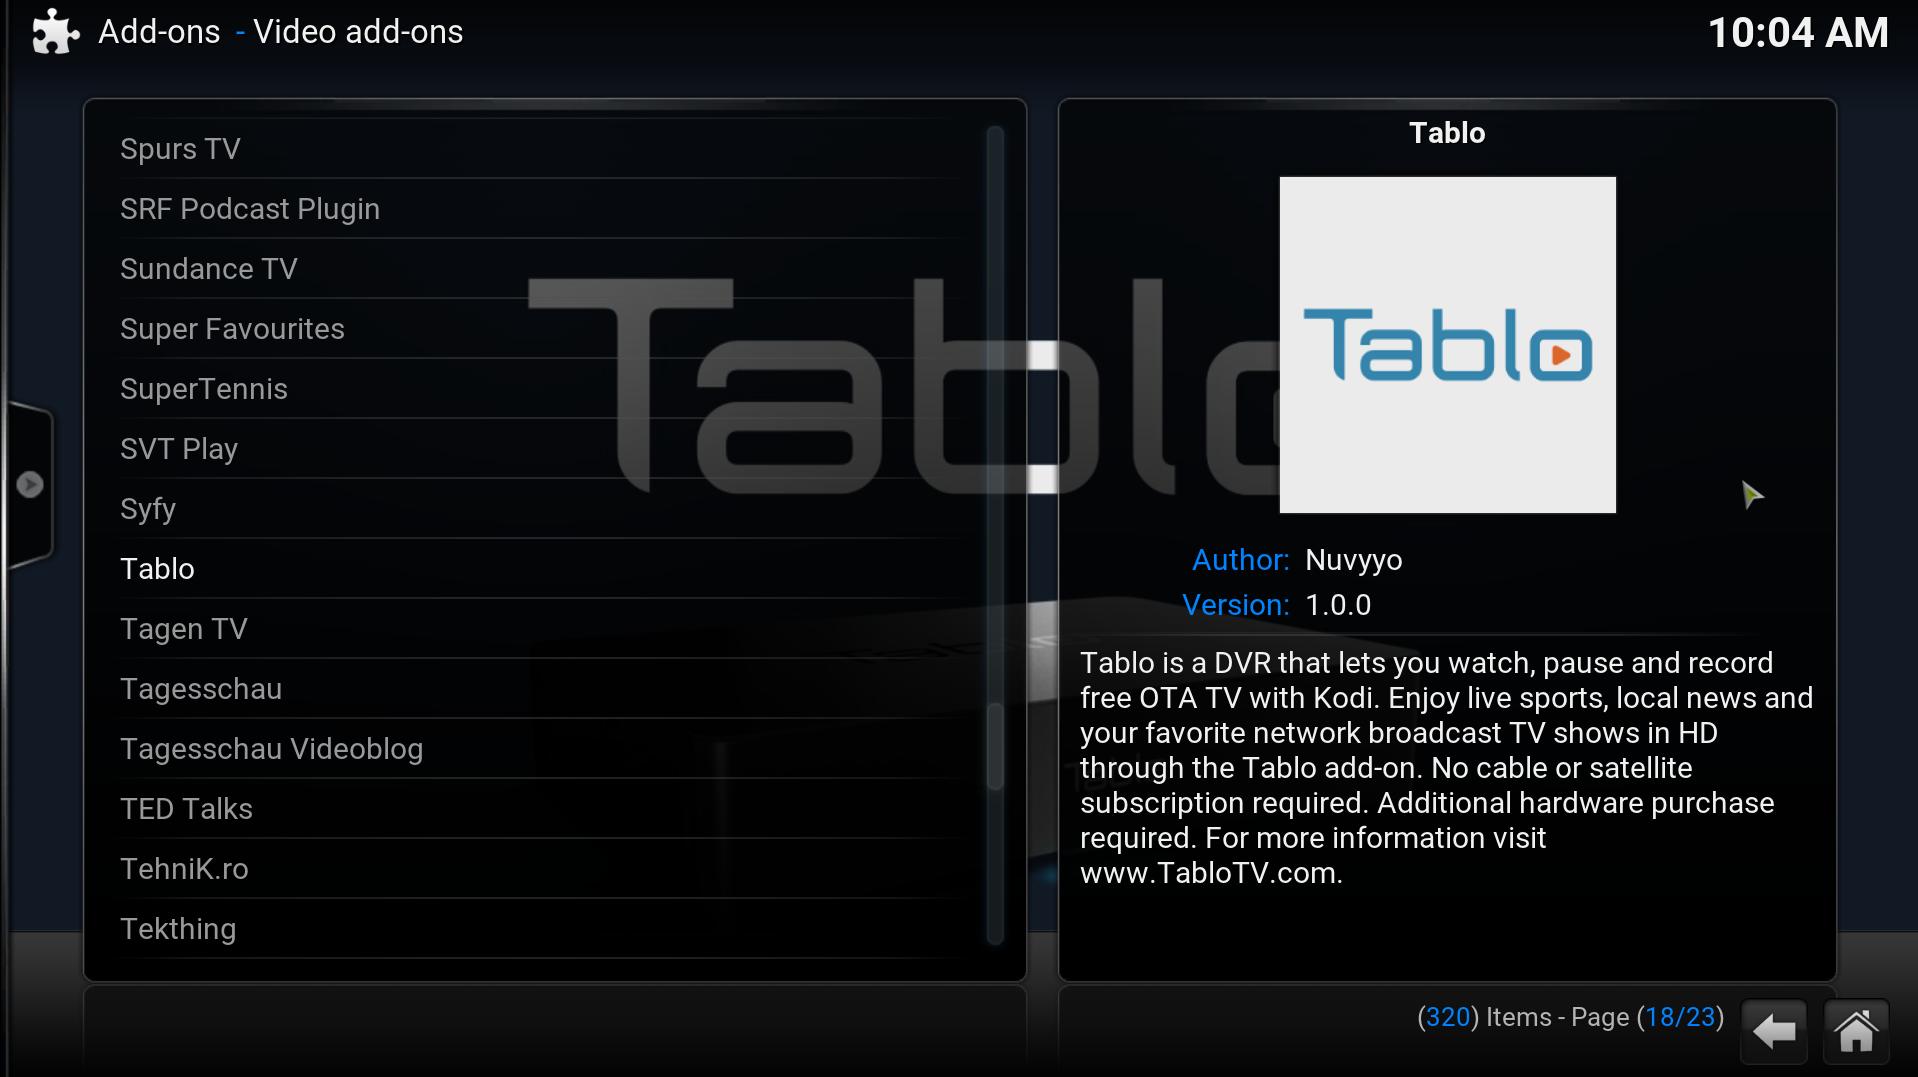 NEW - Tablo Add-On for KODI - Announcements - TabloTV Community